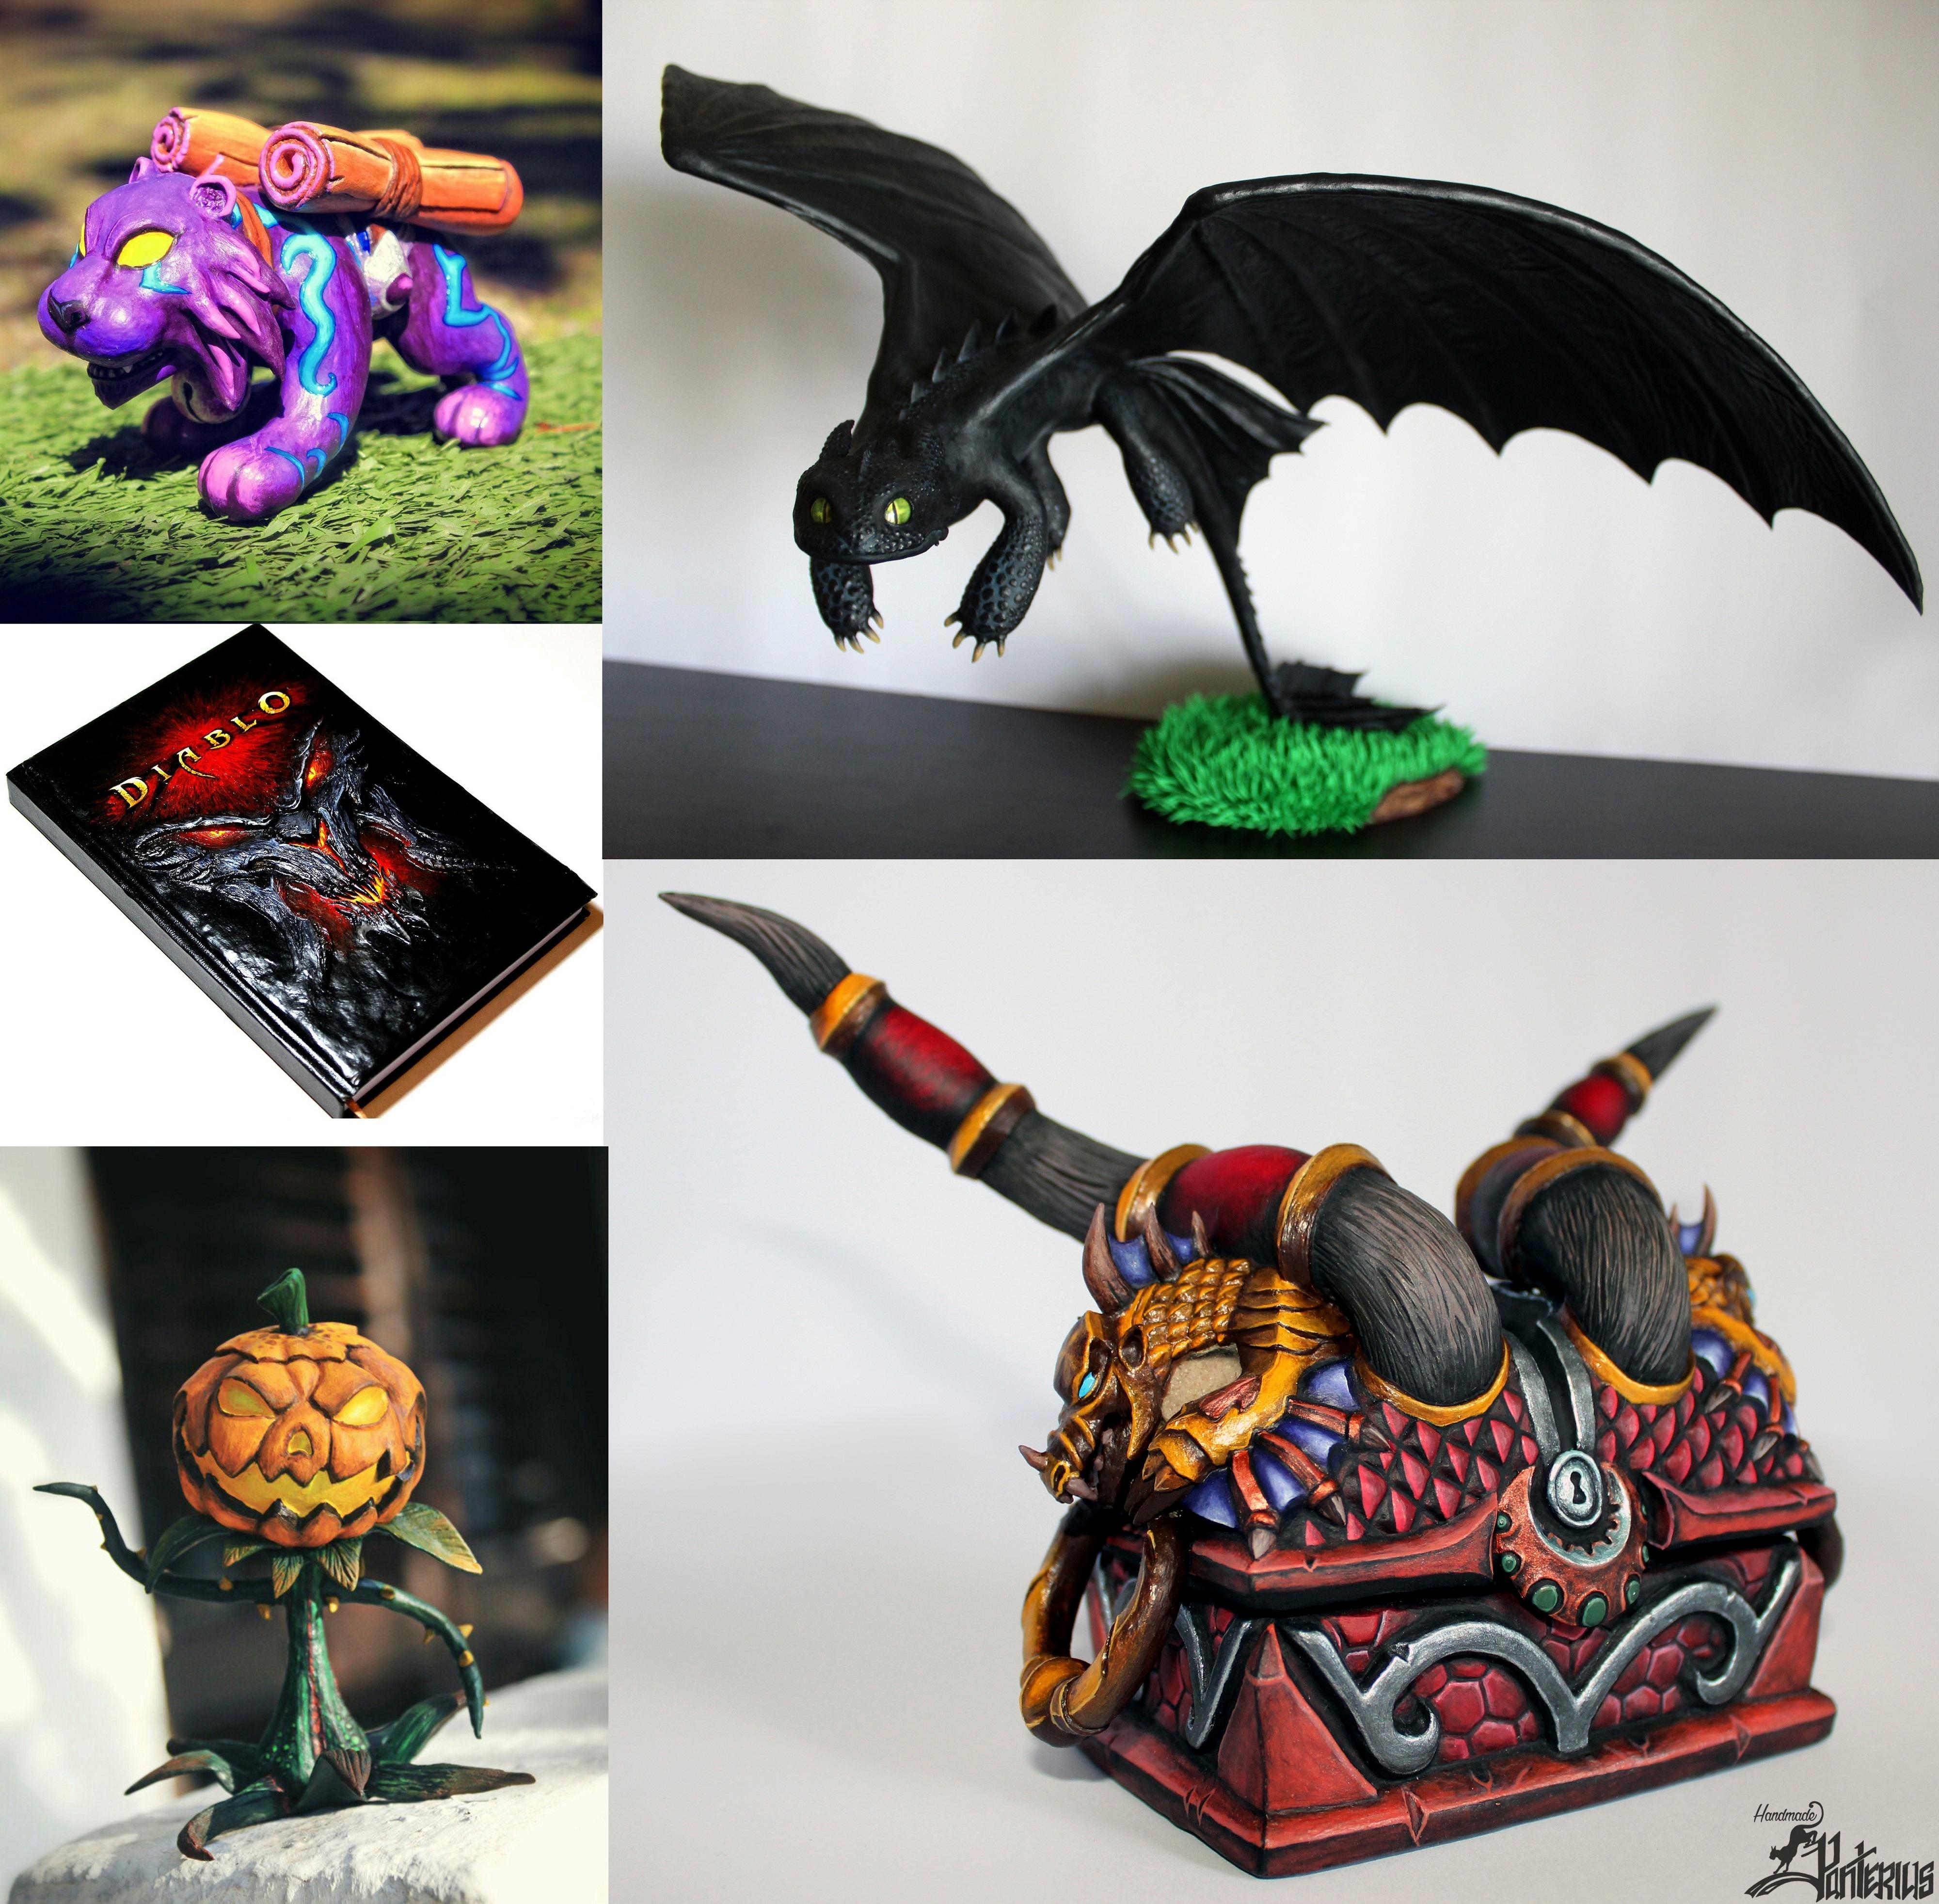 c94cadab3 Wowhead s Artist s Corner and Giveaway - Panterius - Wowhead News